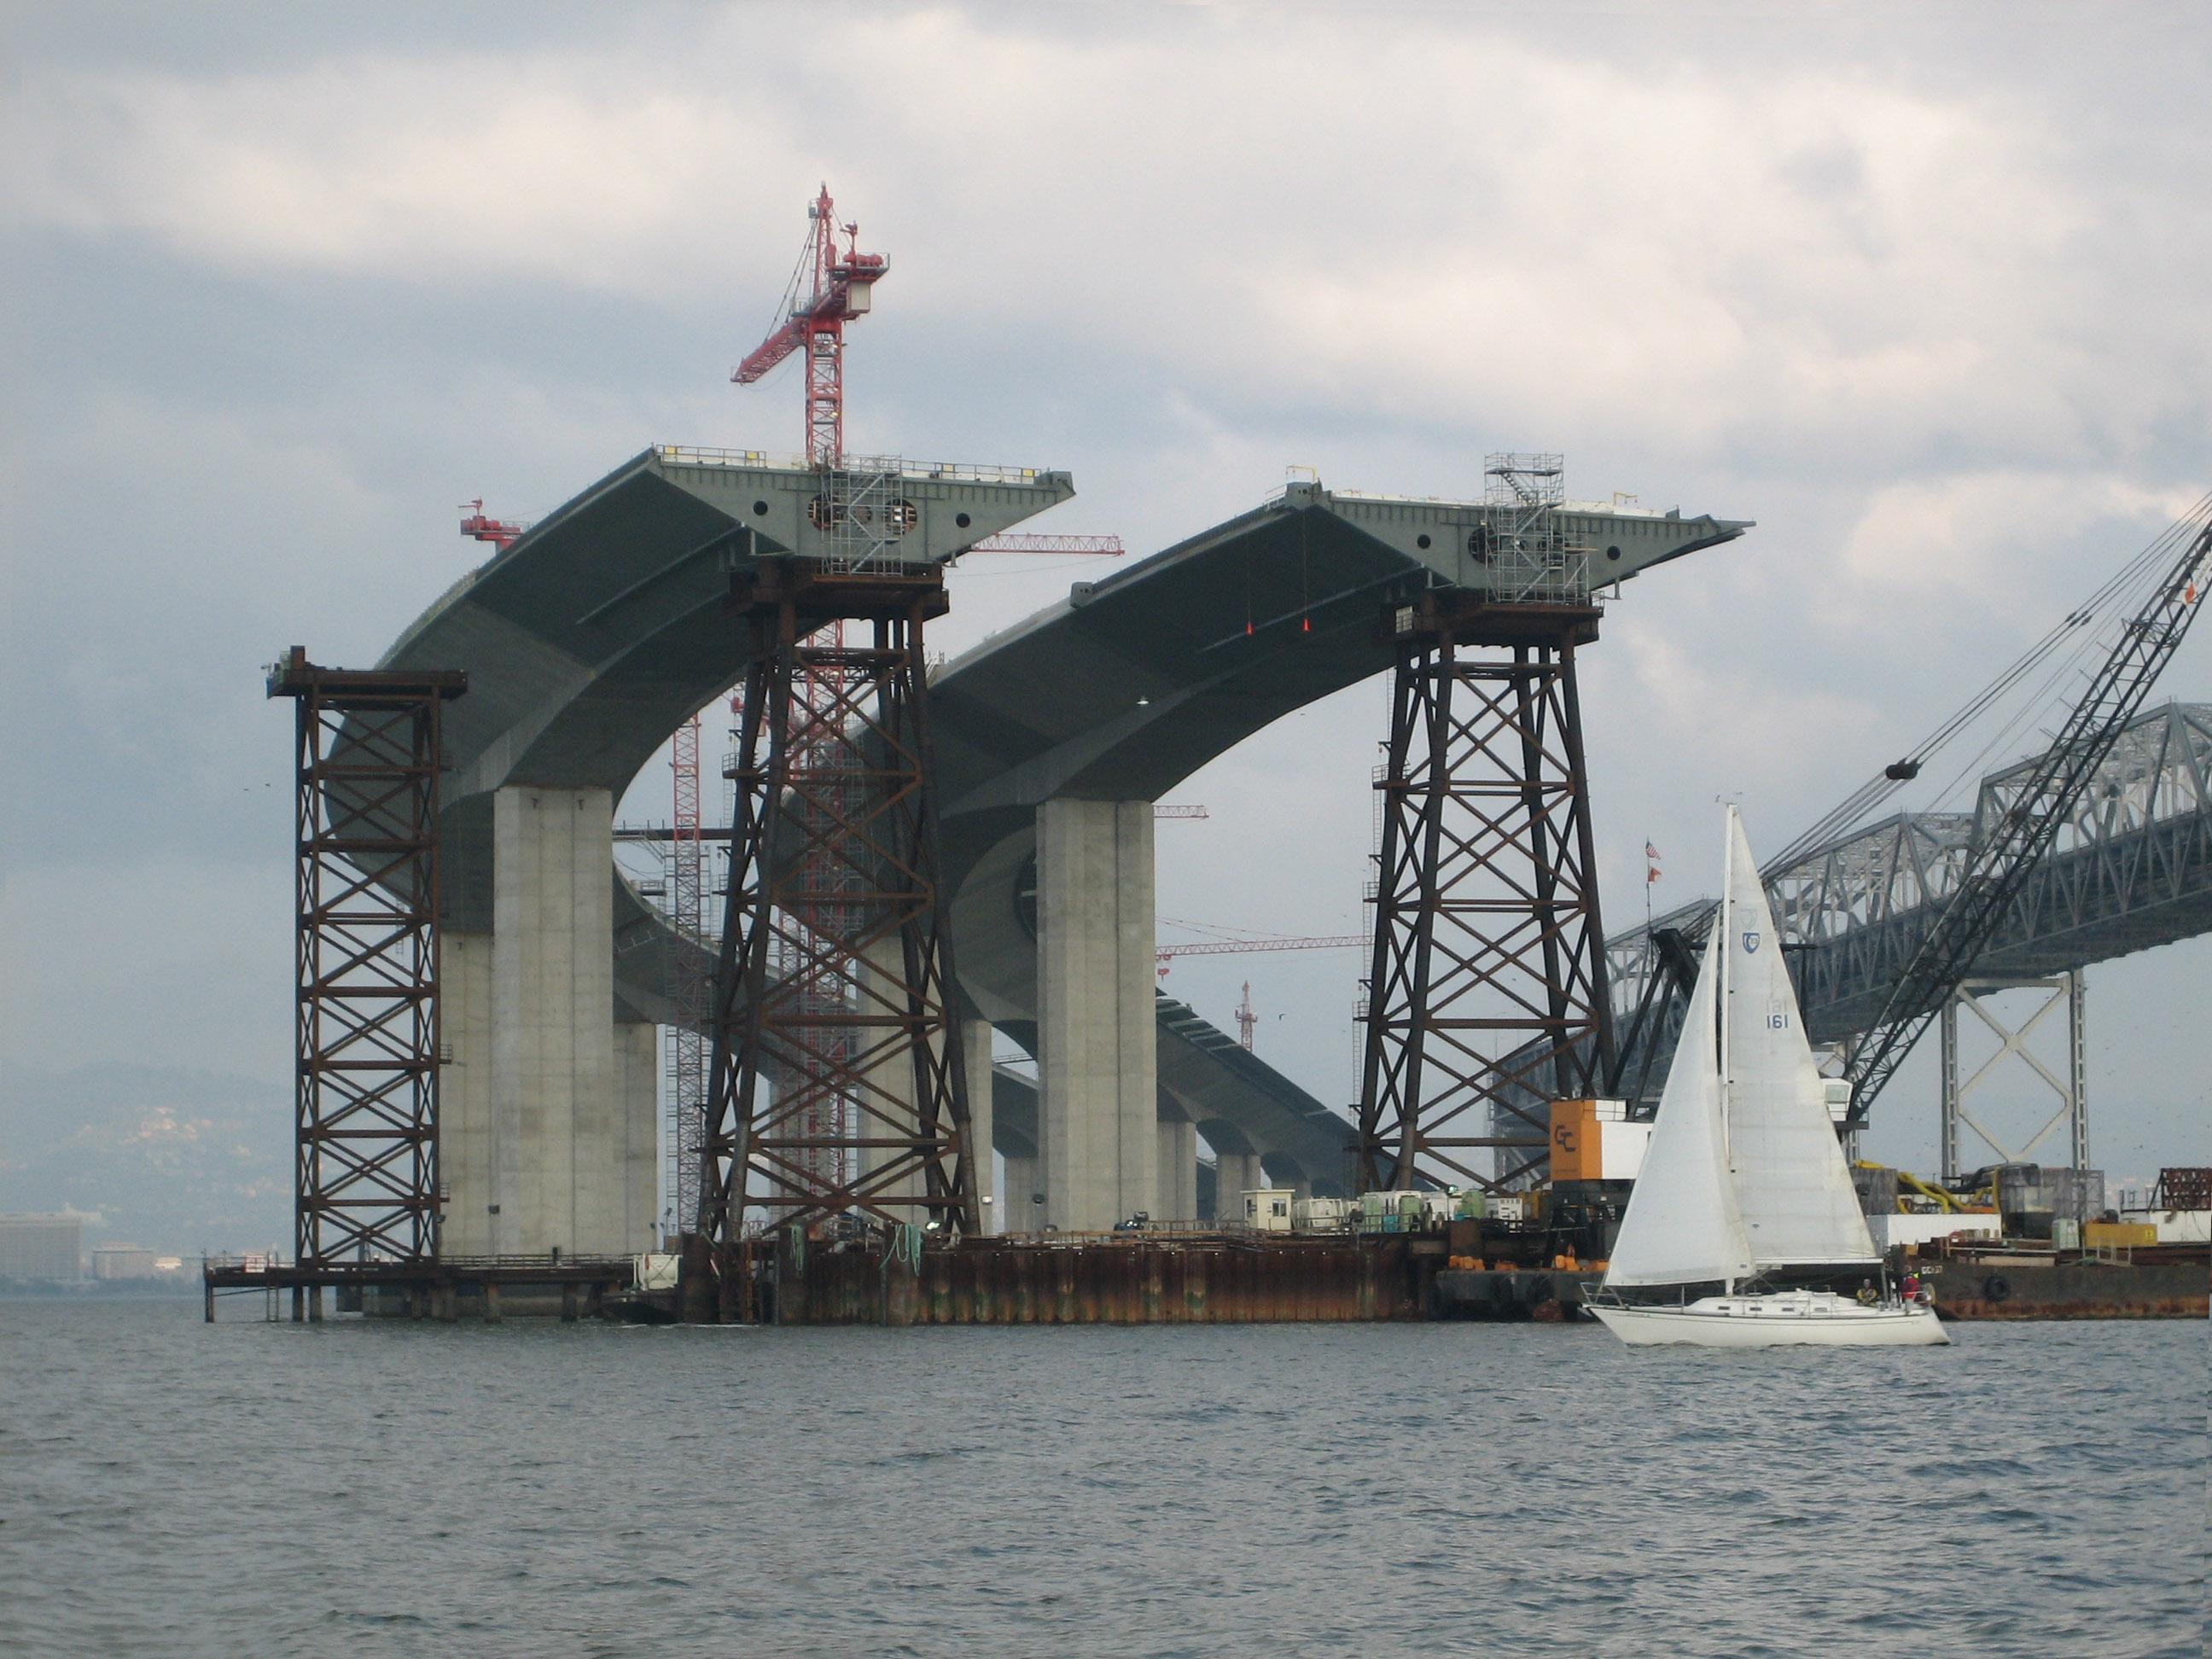 File:Bay bridge construction.jpg - Wikipedia